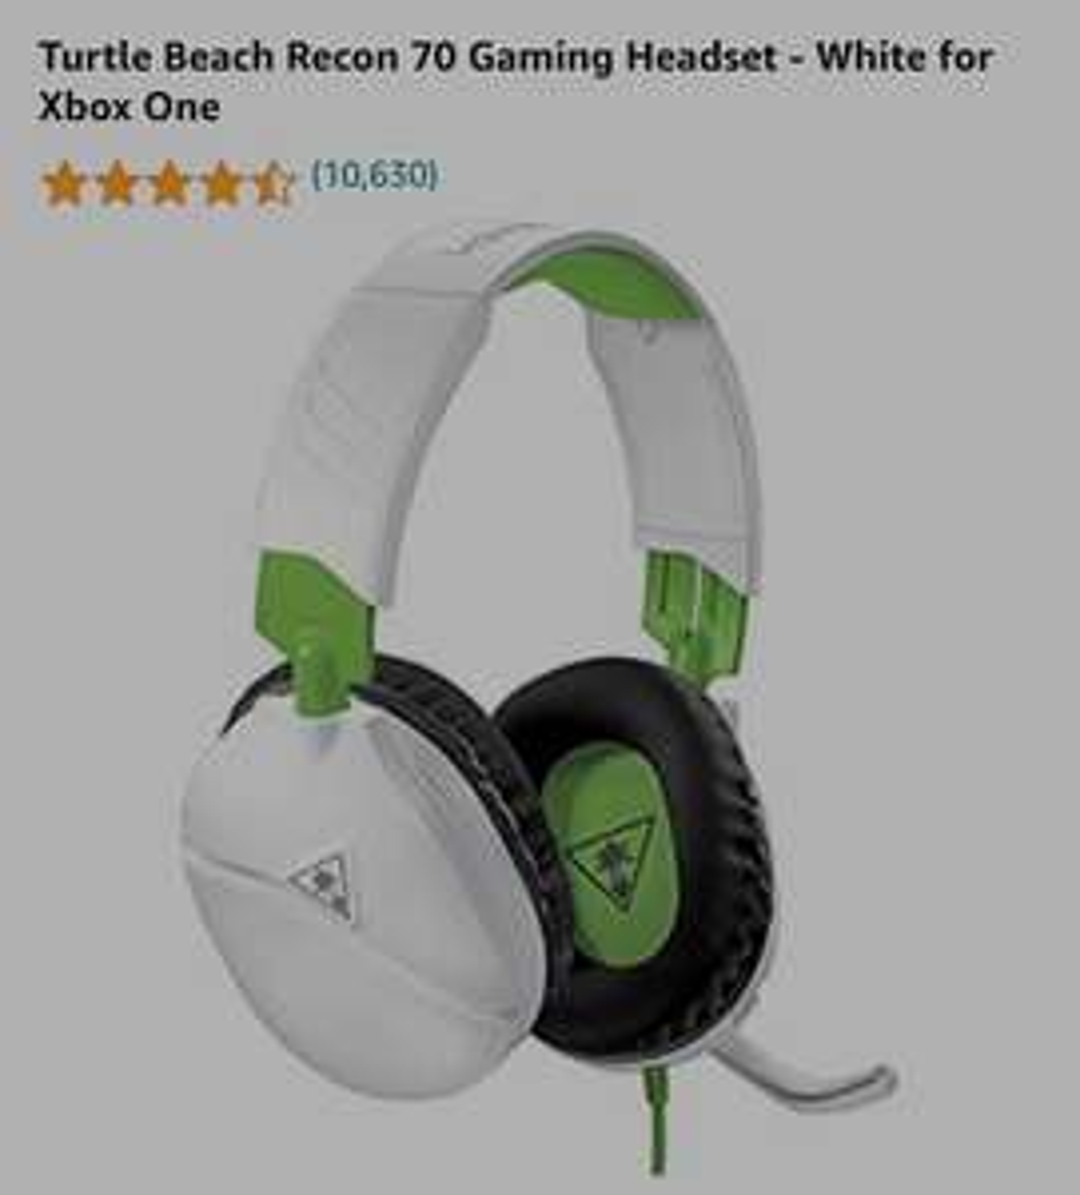 Amazon: Turtle Beach Recon 70 Gaming Headset - White for Xbox One